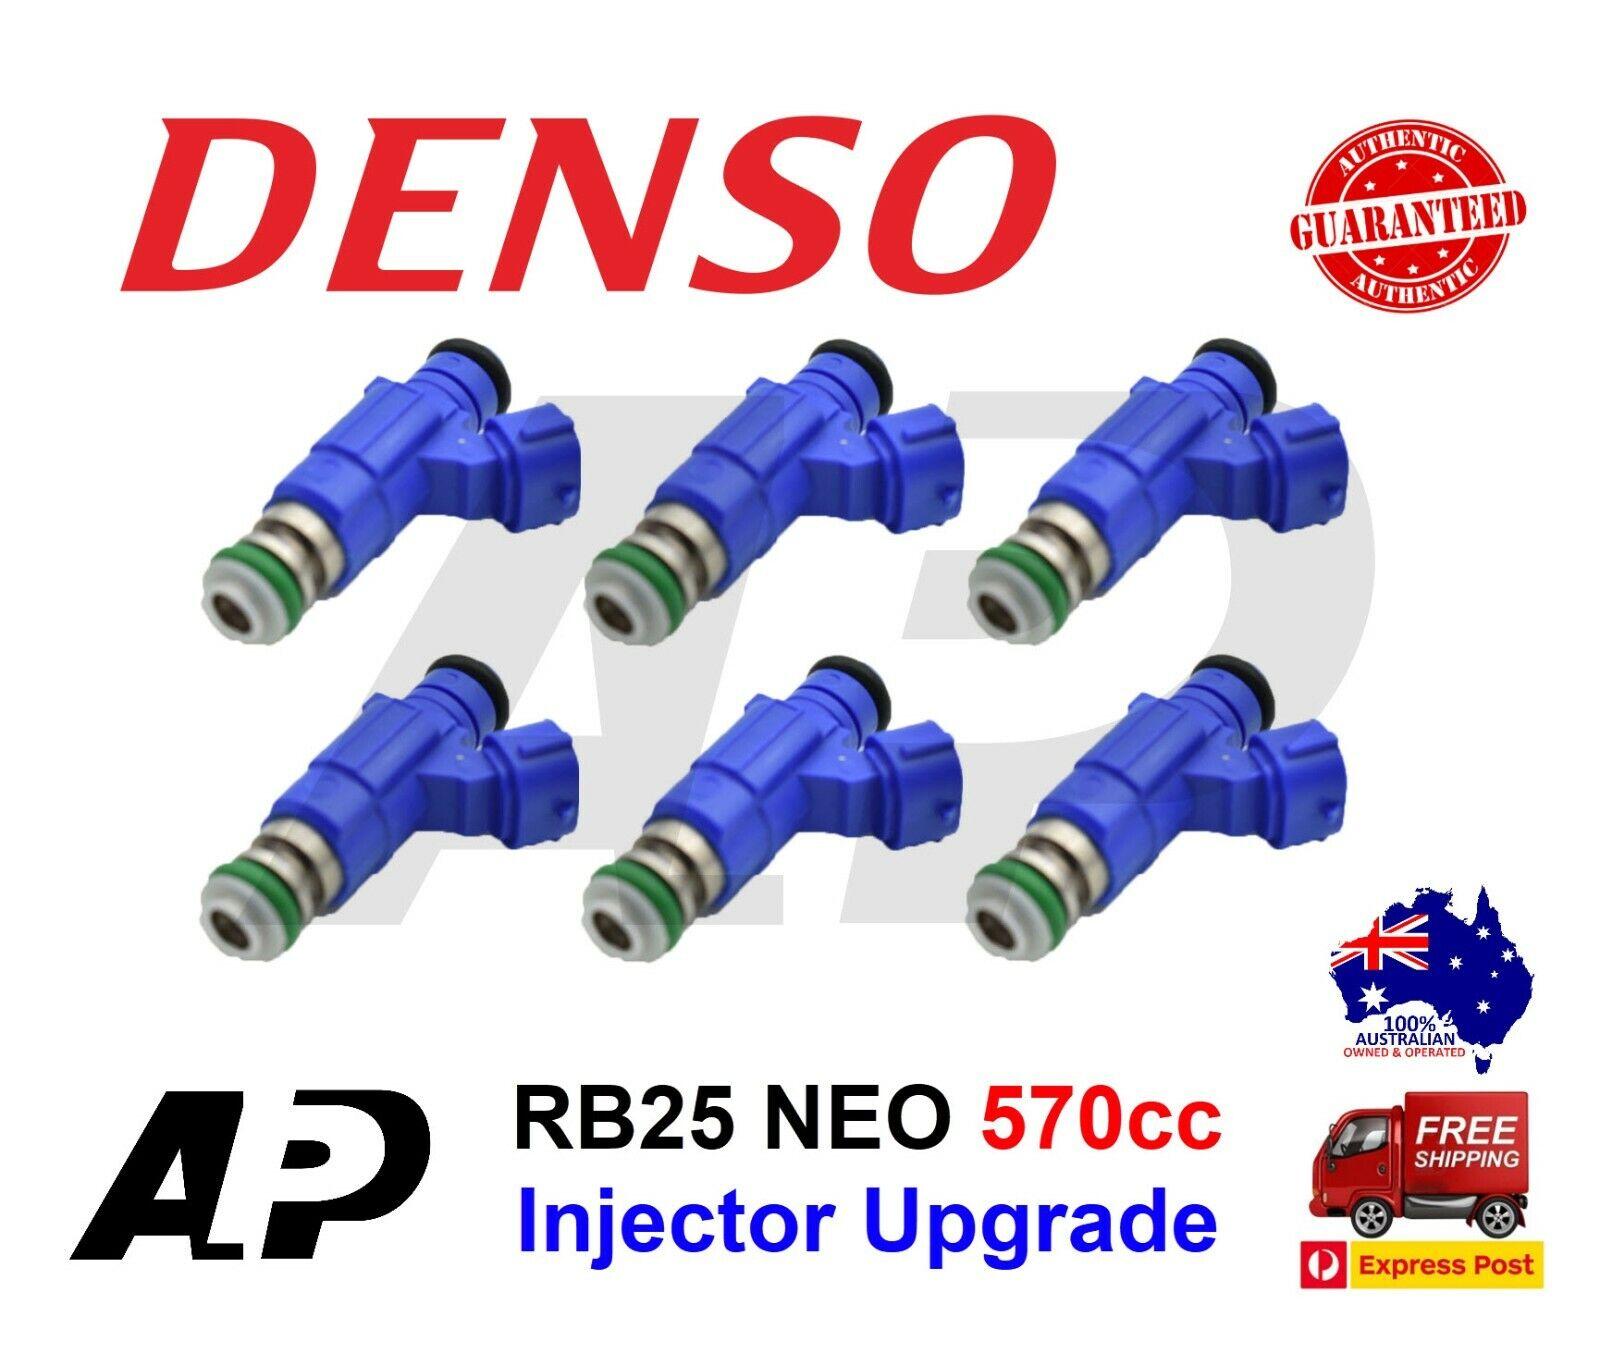 6x 1200cc Fuel Injectors for NISSAN NISMO SKYLINE R34 RB25DET NEO ER34 fit DENSO